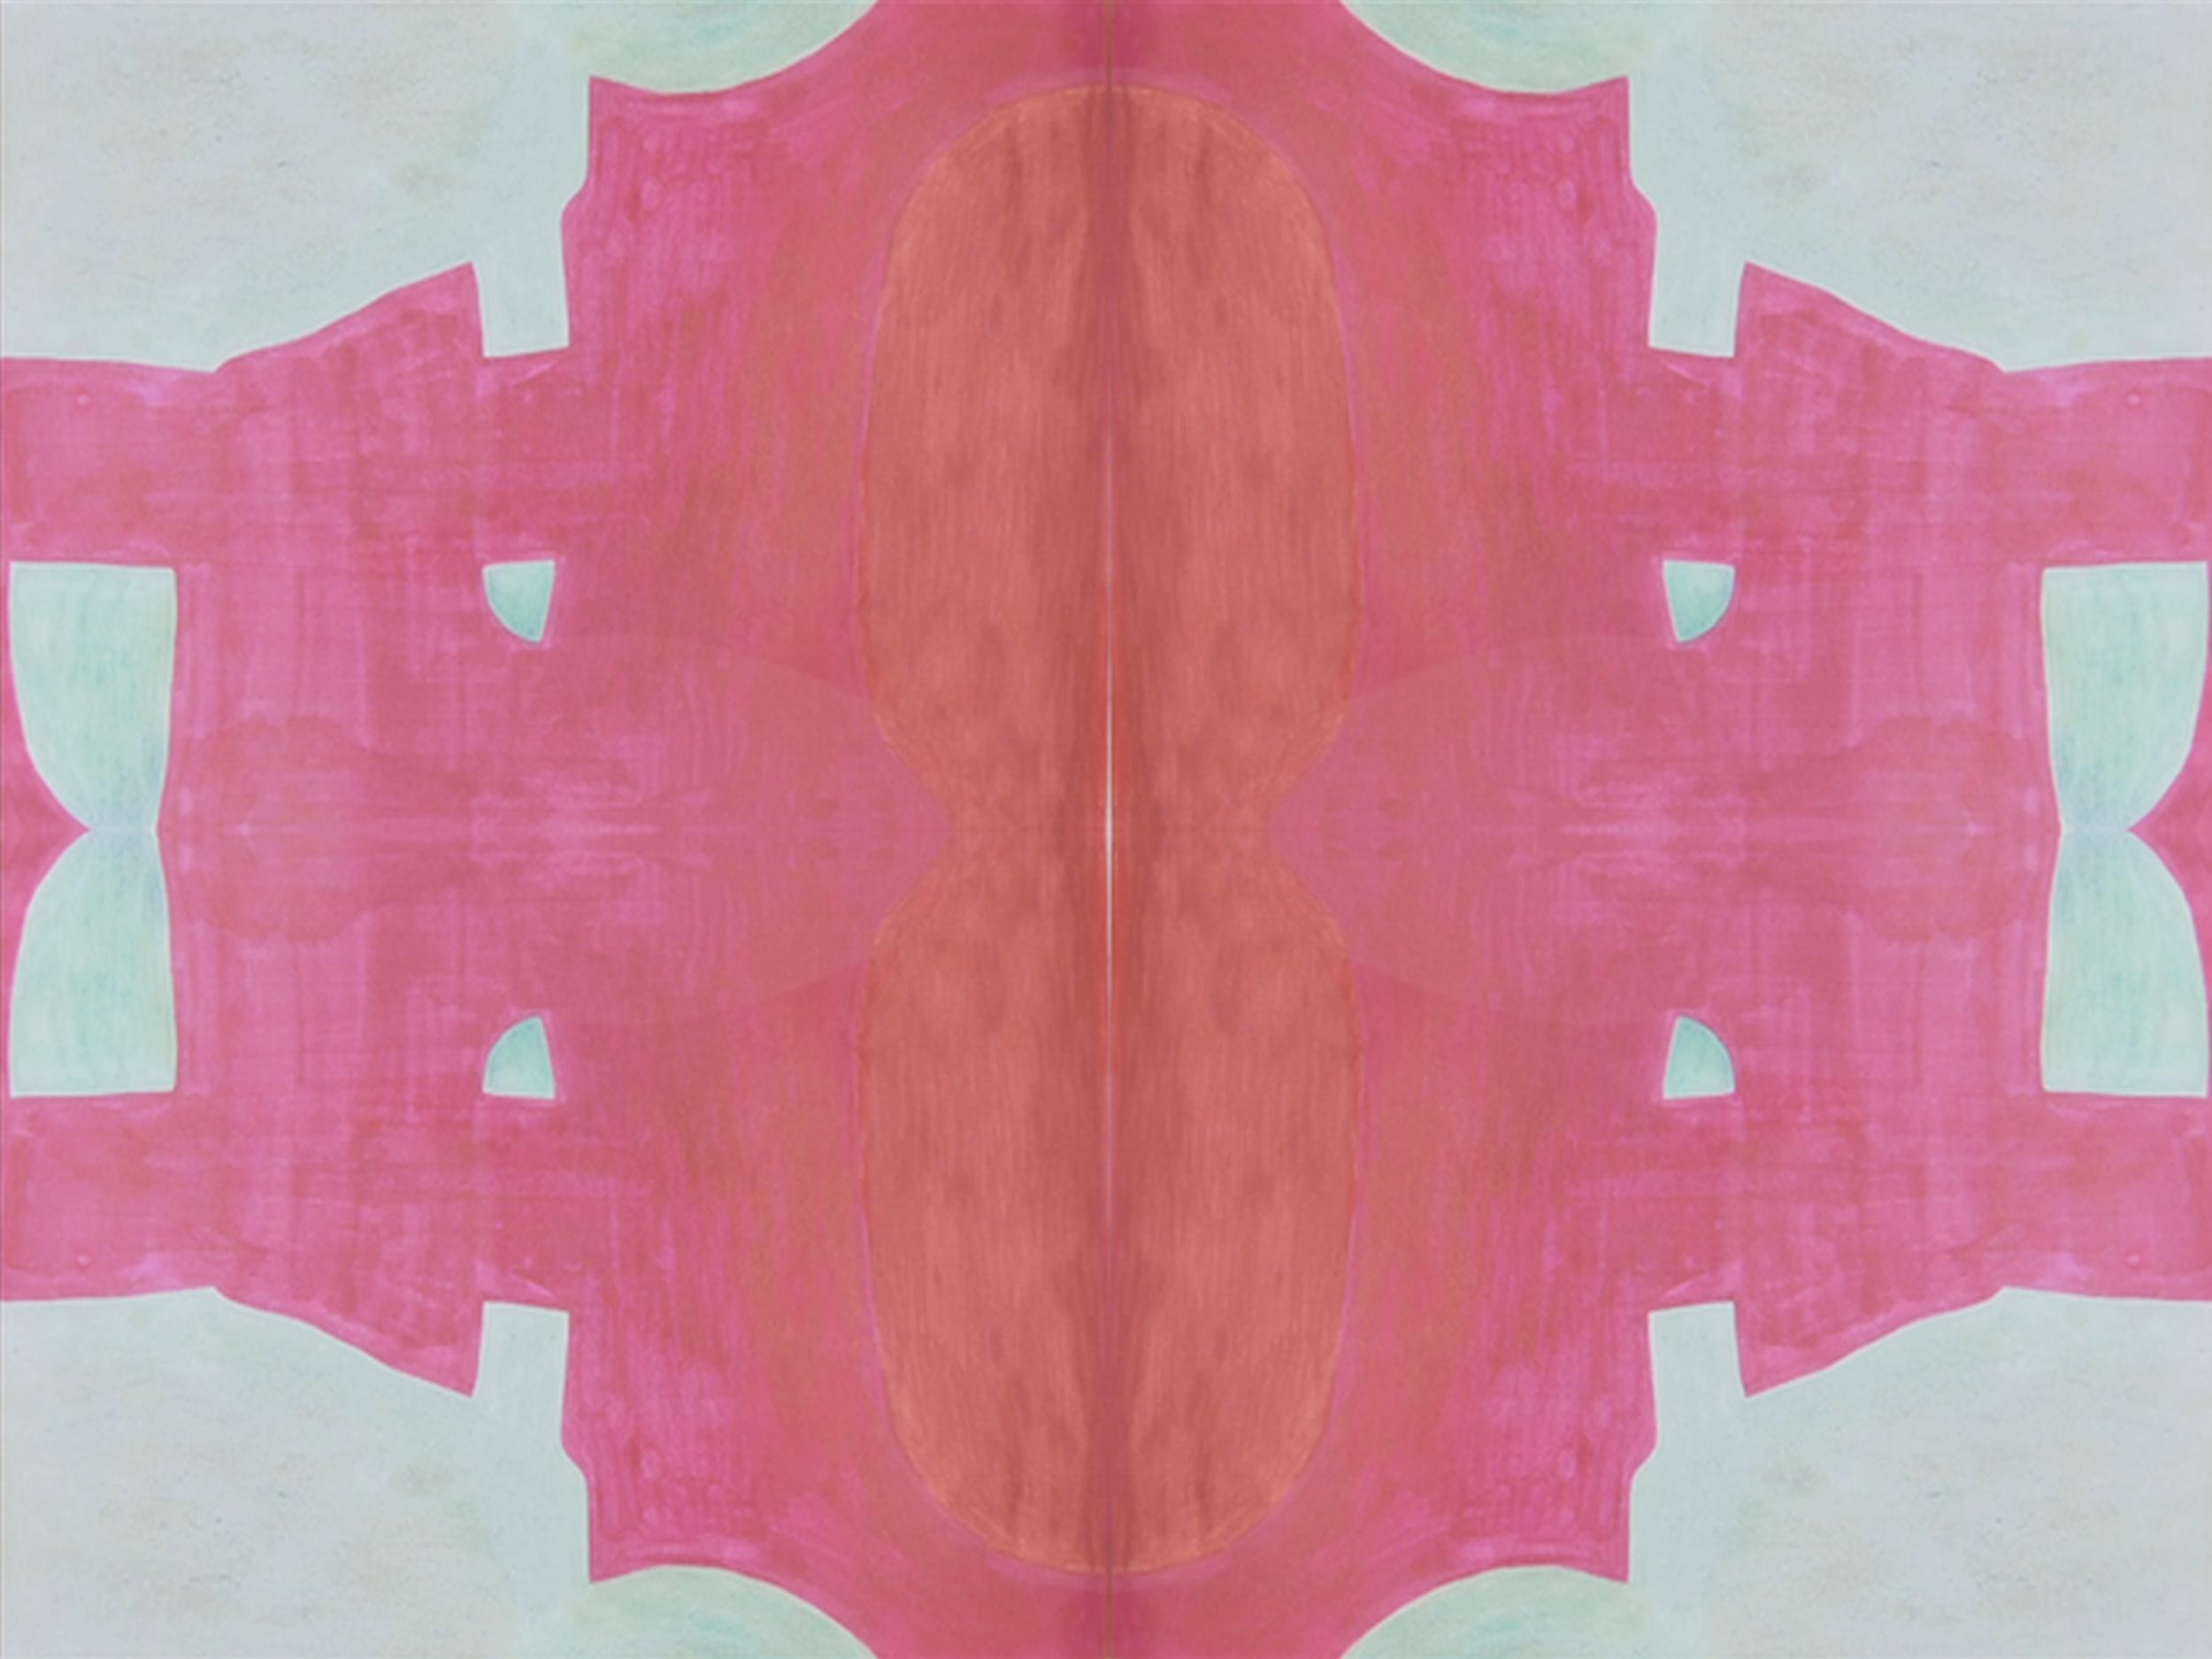 sc_ 1231.png